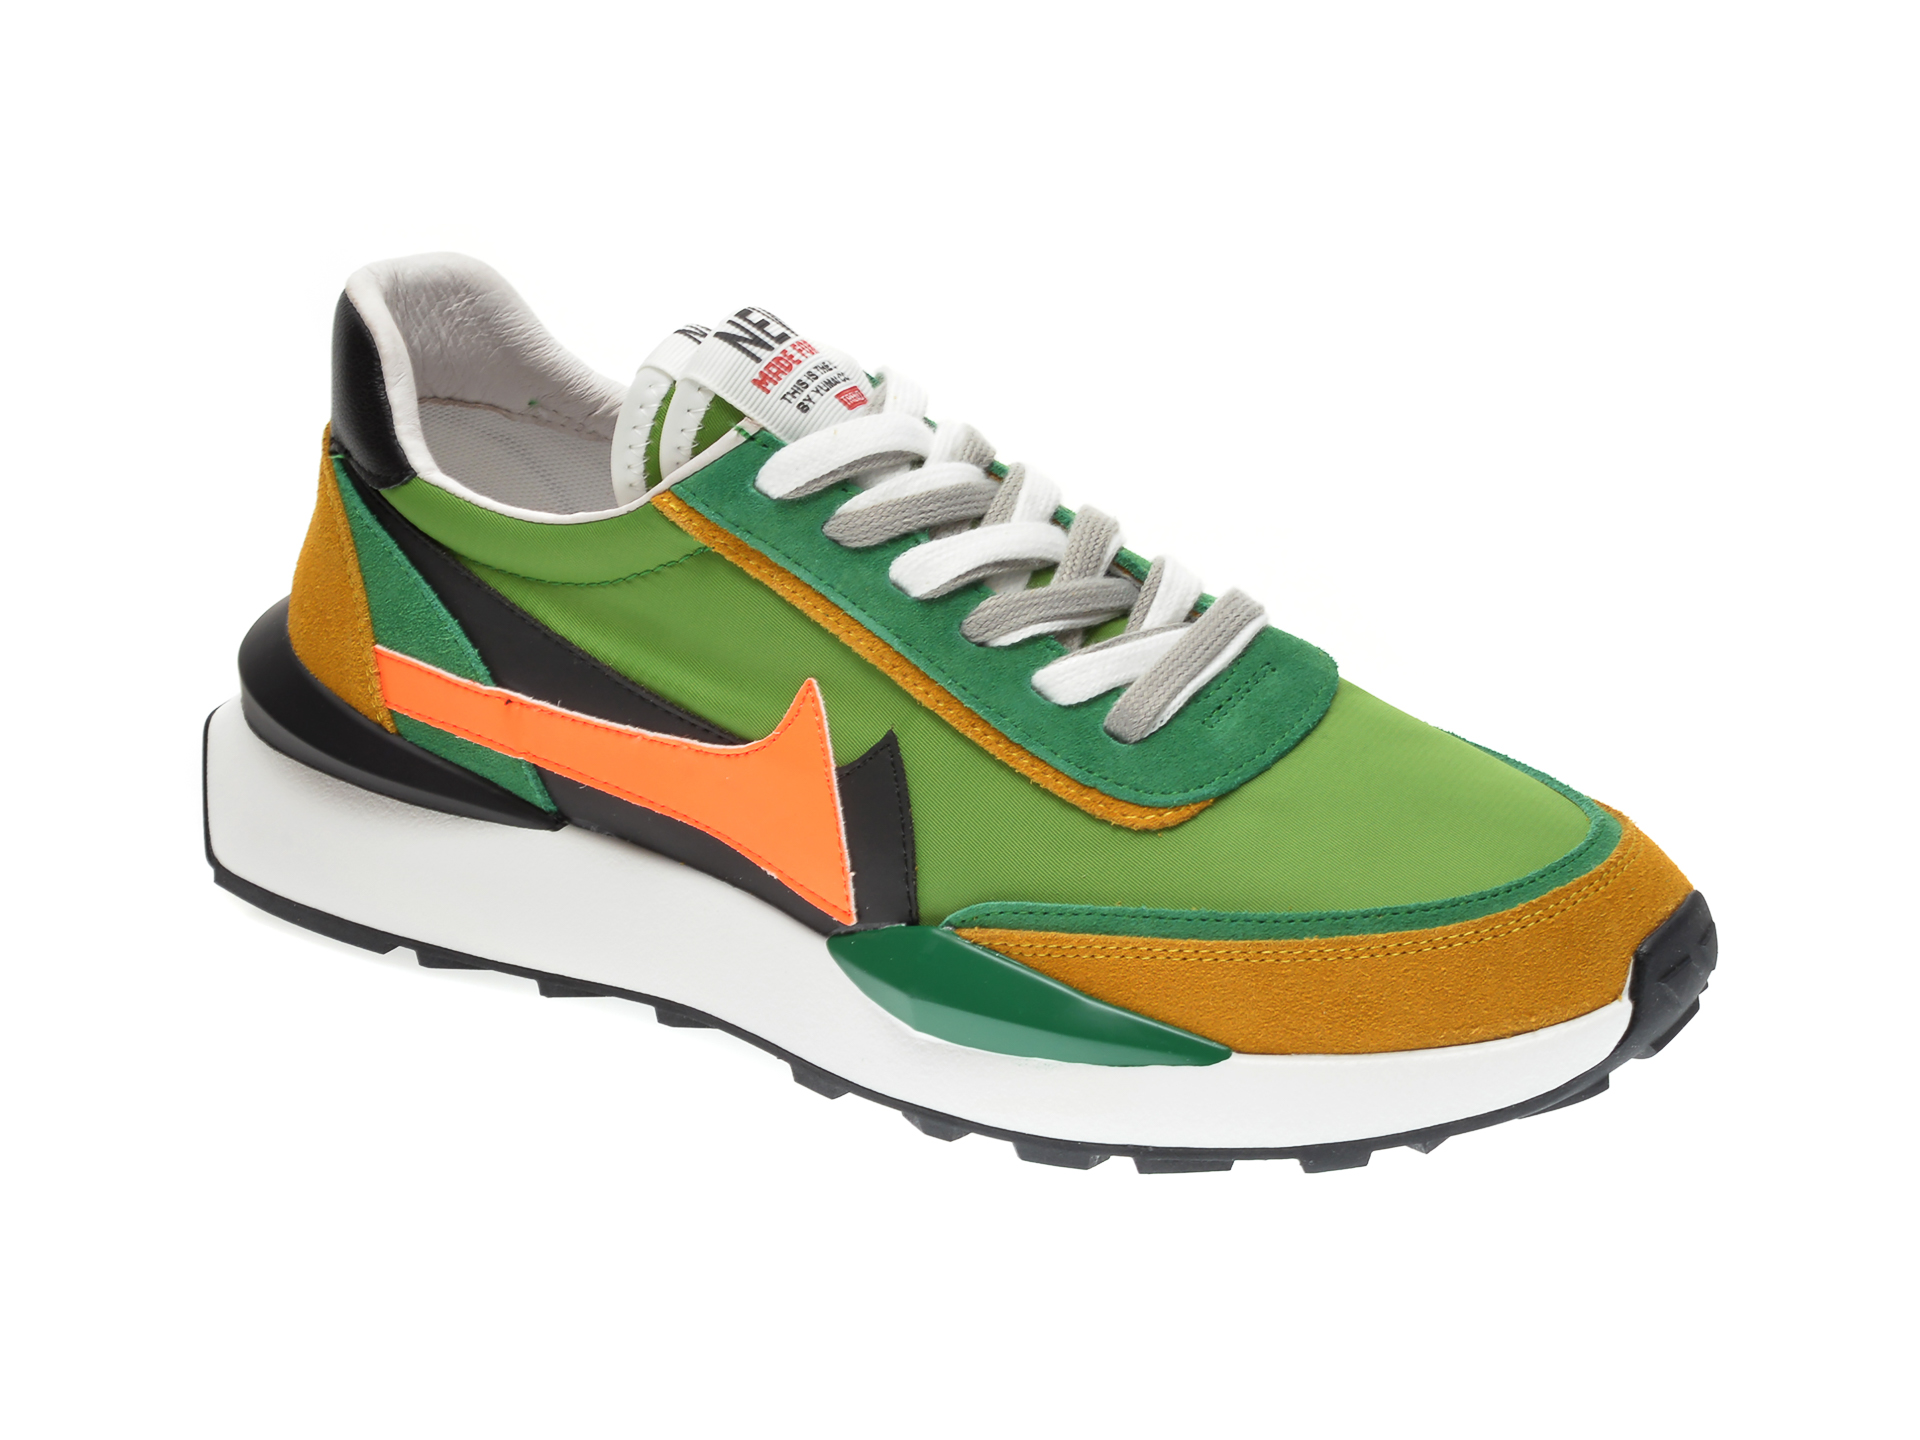 Pantofi sport GRYXX verzi, 207016, din material textil si piele intoarsa imagine